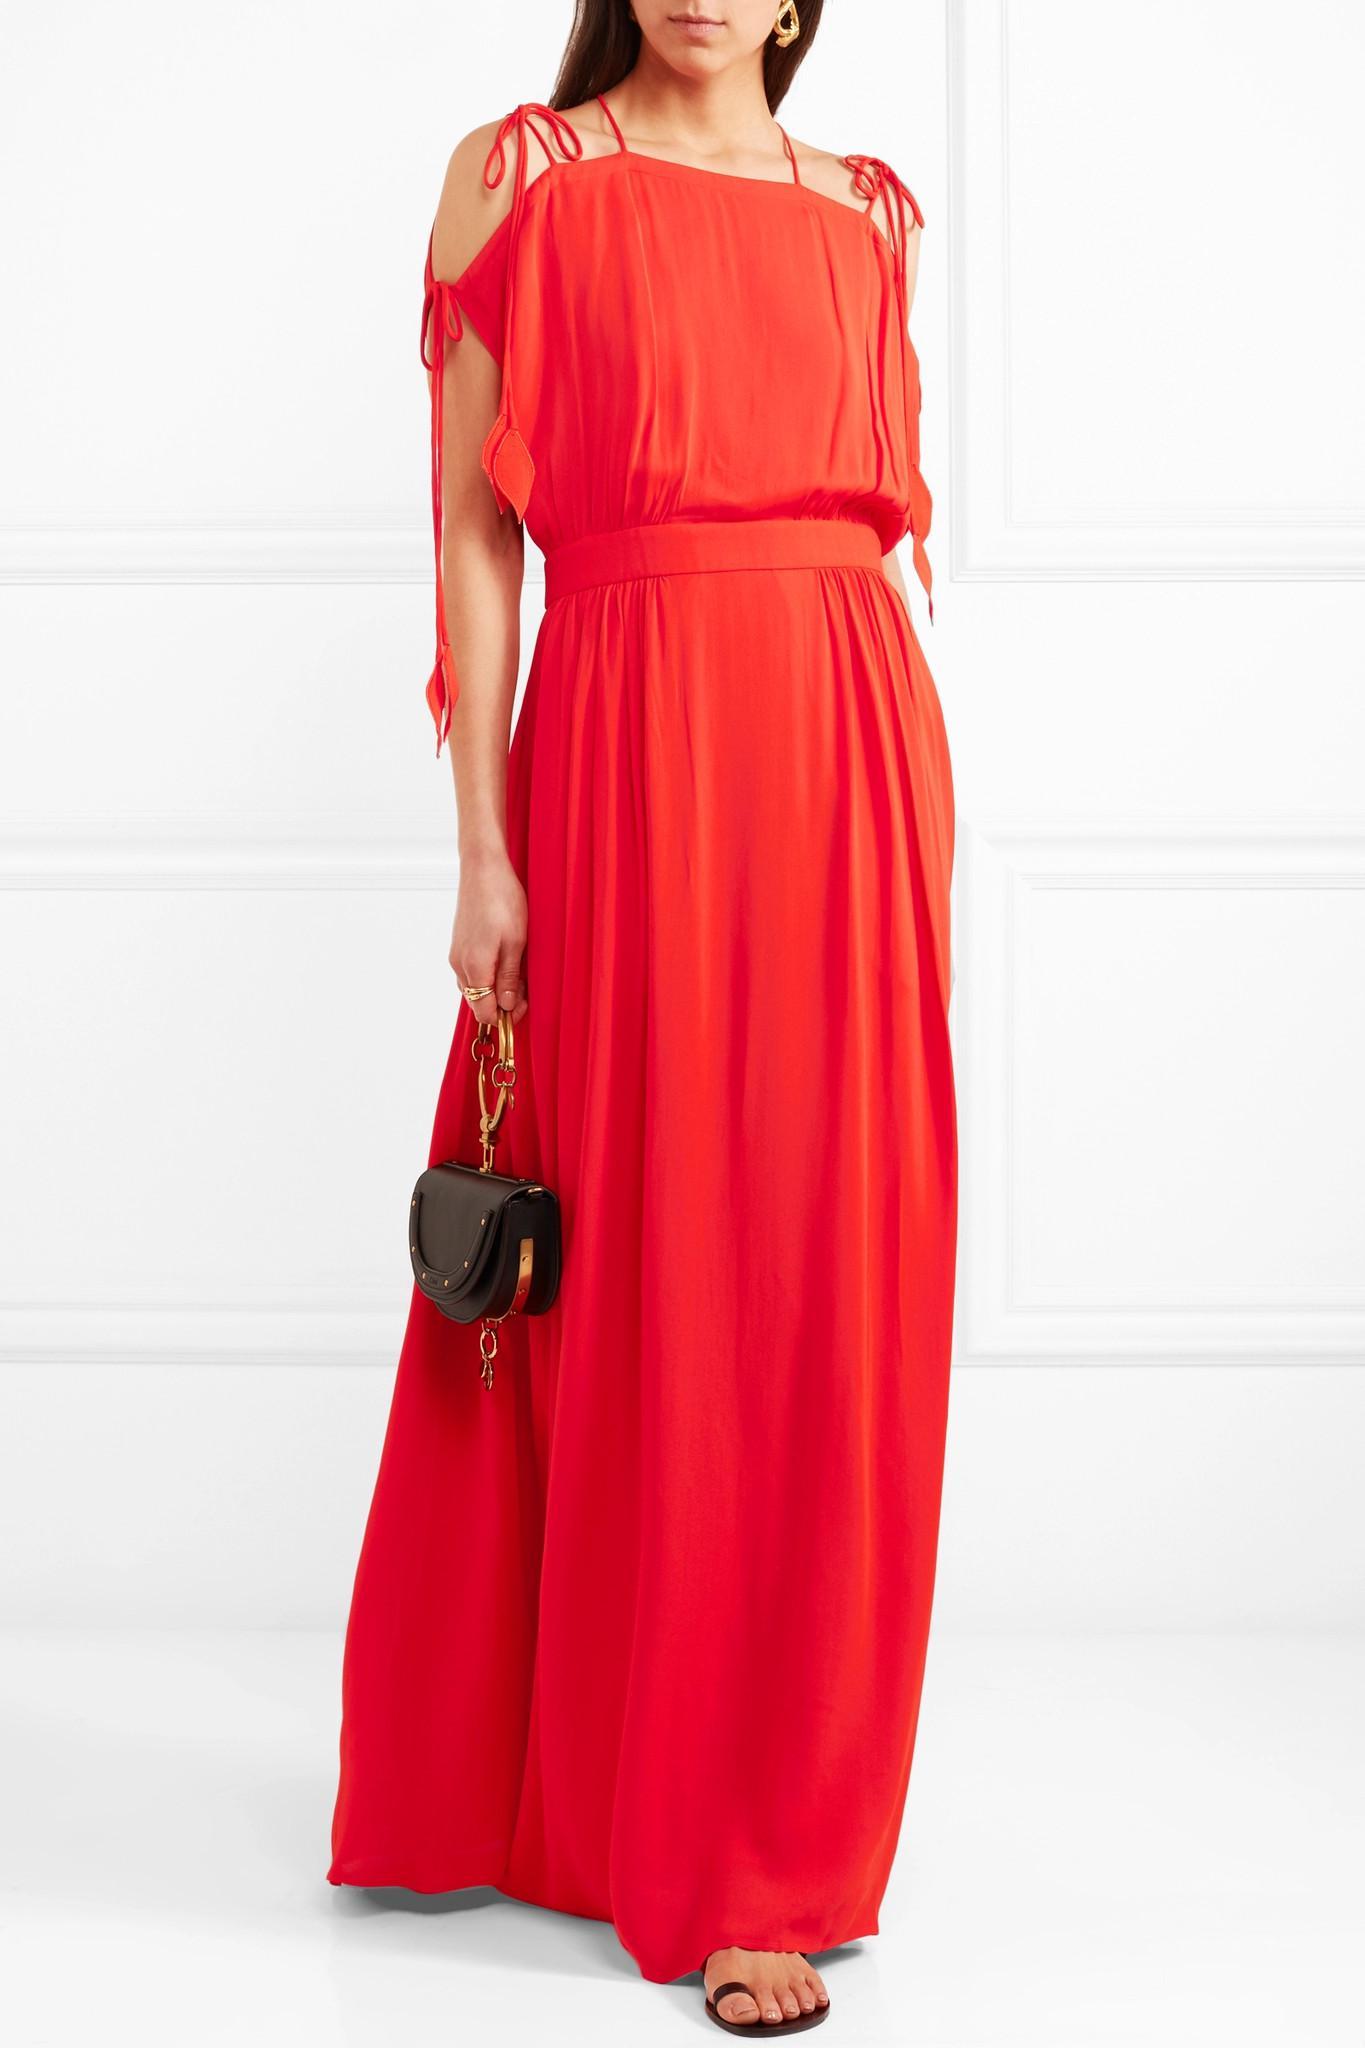 Evaline Chiffon Maxi Dress - Red Tory Burch zs8sFDcoje